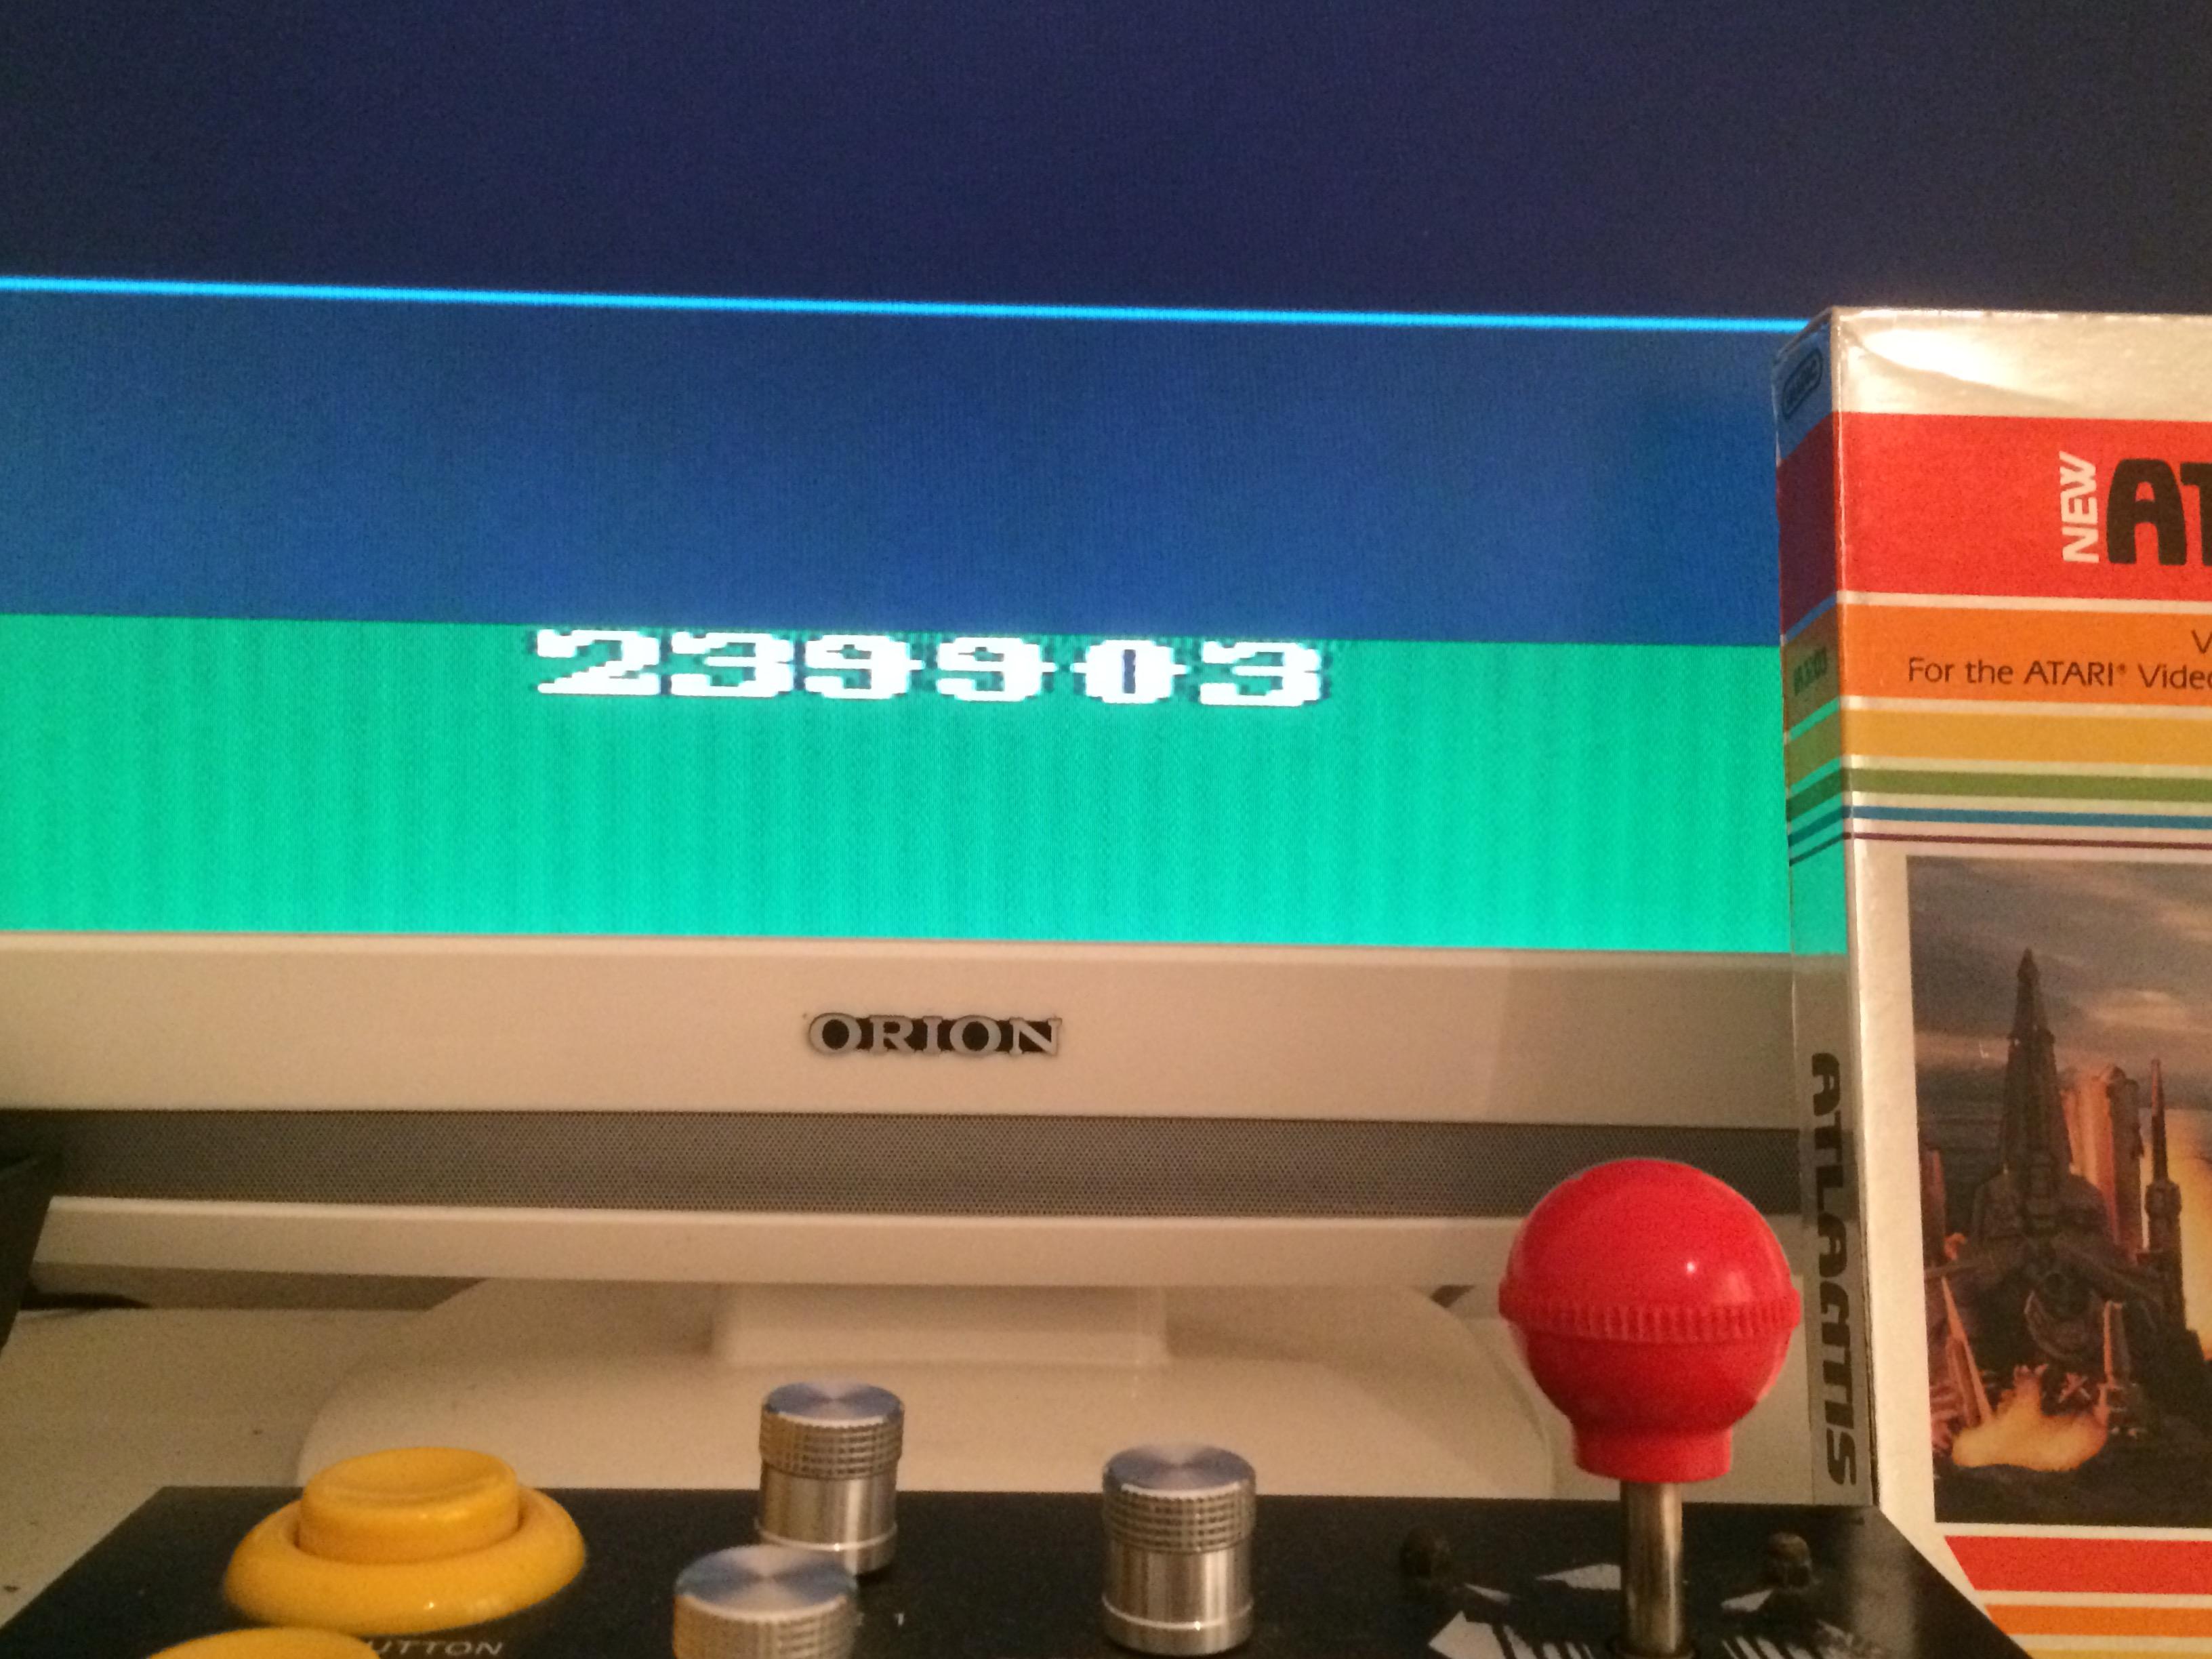 Atlantis 239,903 points